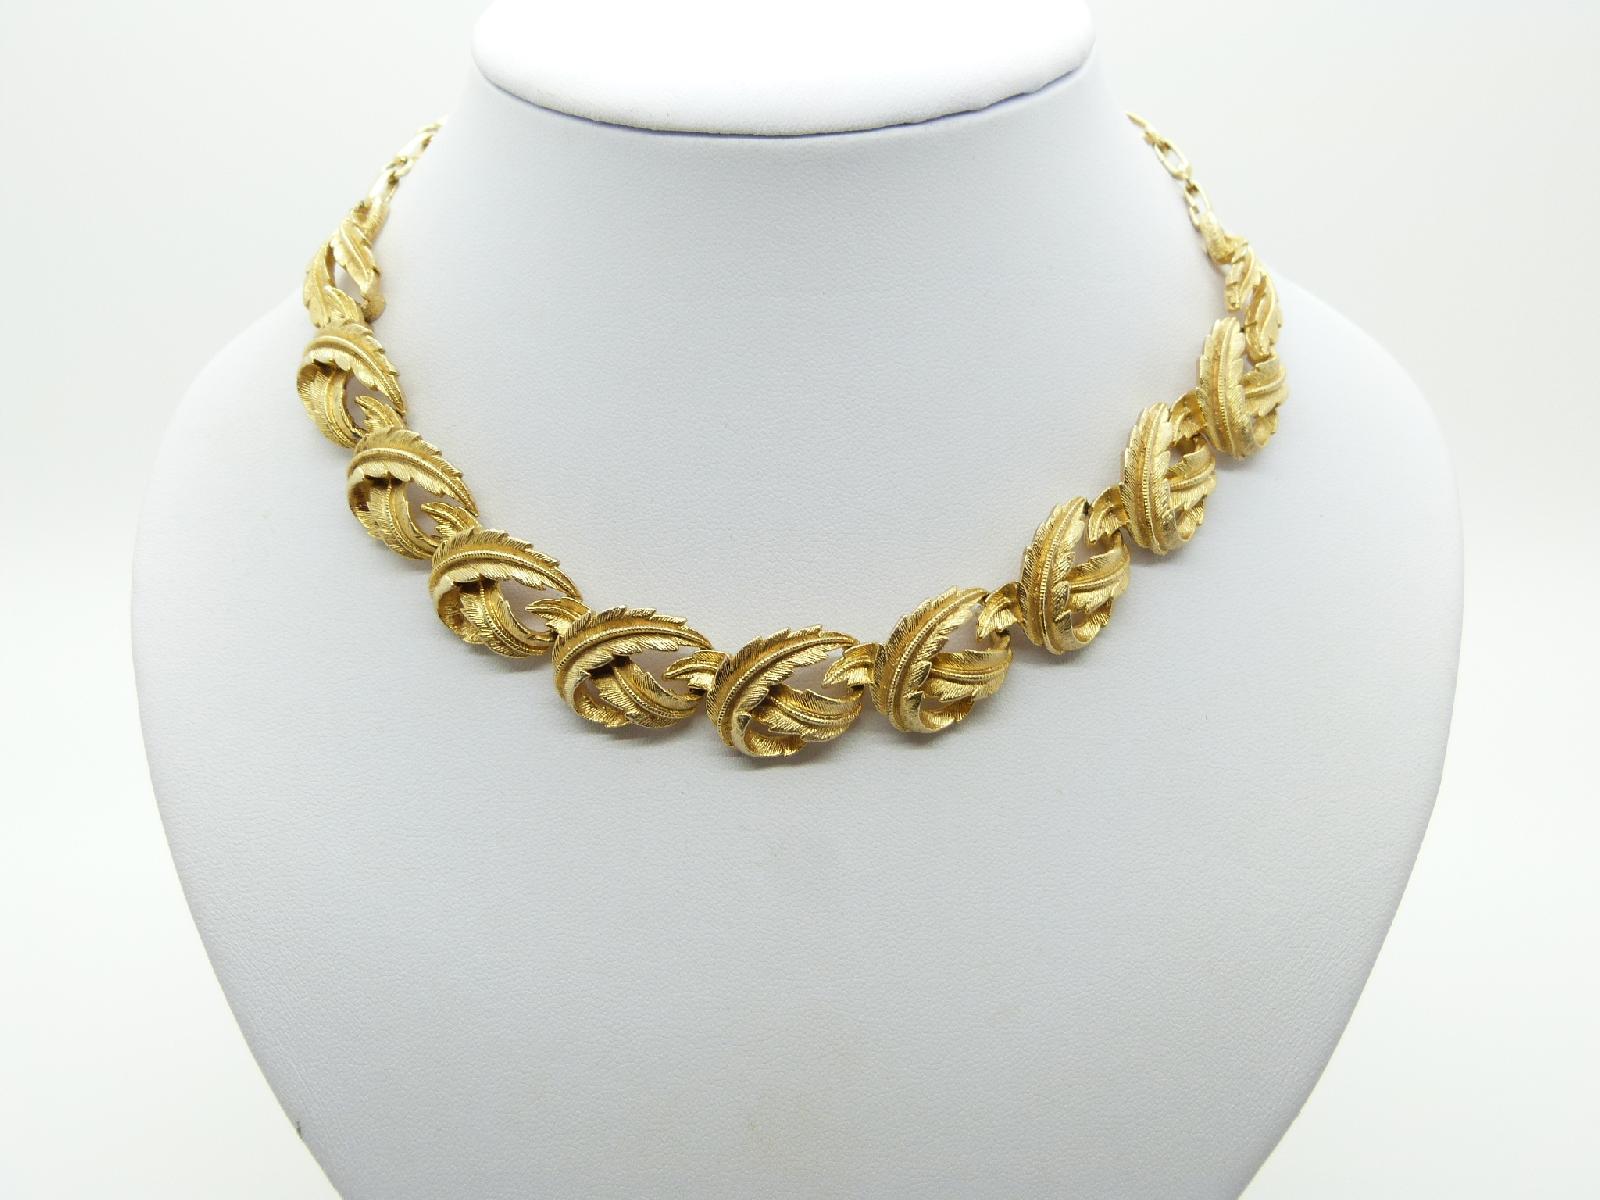 £25.00 - Vintage 50s Classy Signed Coro Heavy Fancy Link Goldtone Necklace